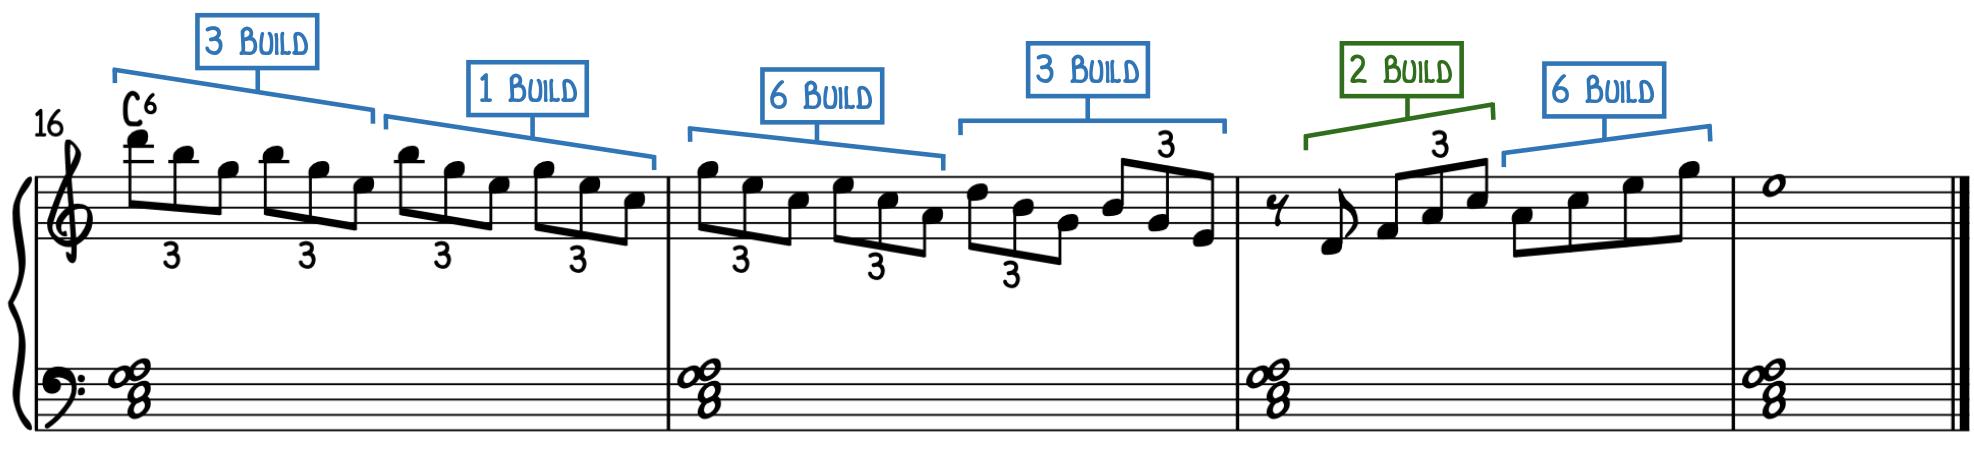 Solo Example 3